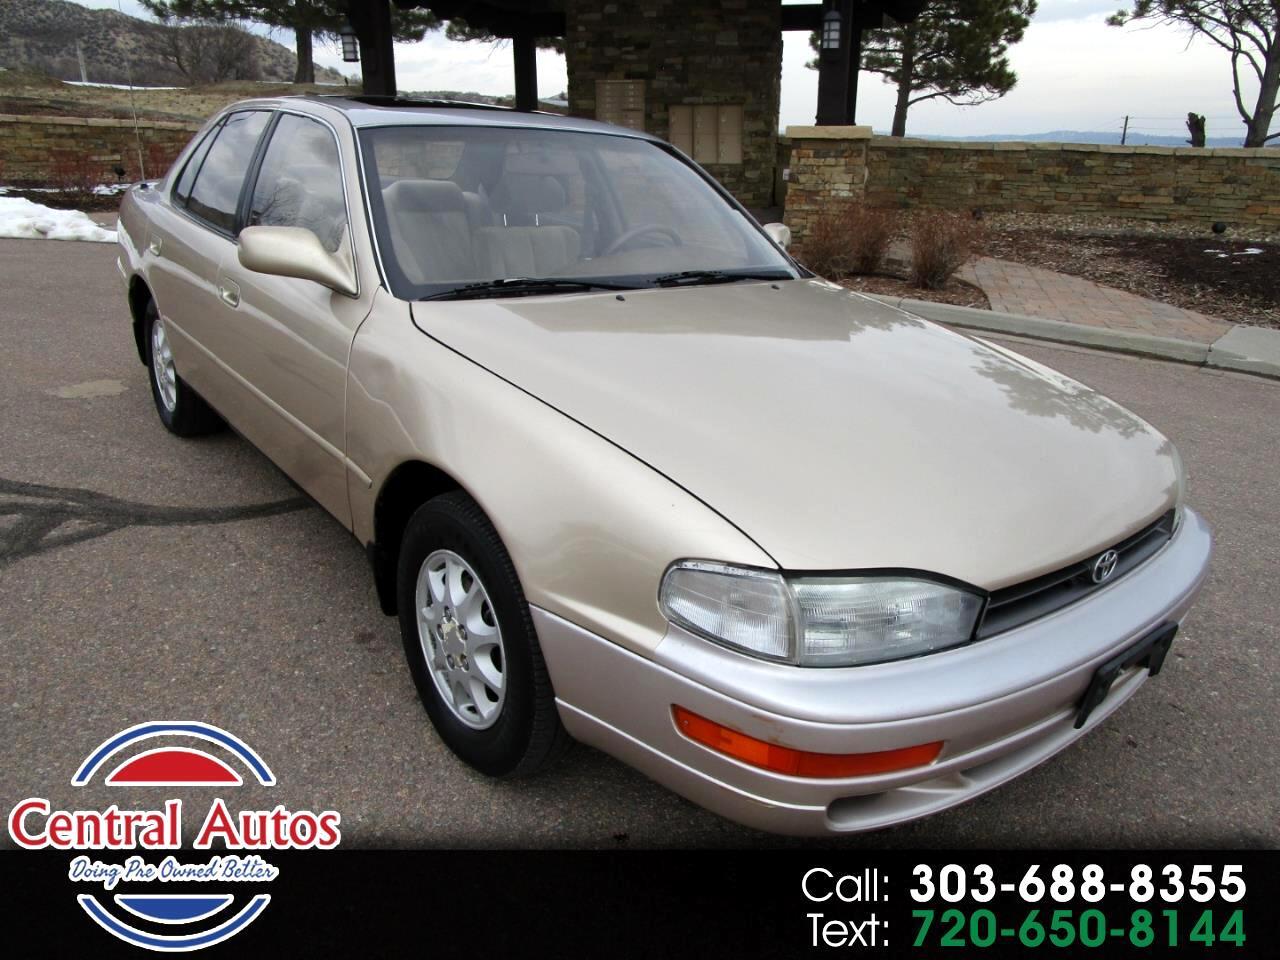 1994 Toyota Camry 4dr Sedan XLE Auto